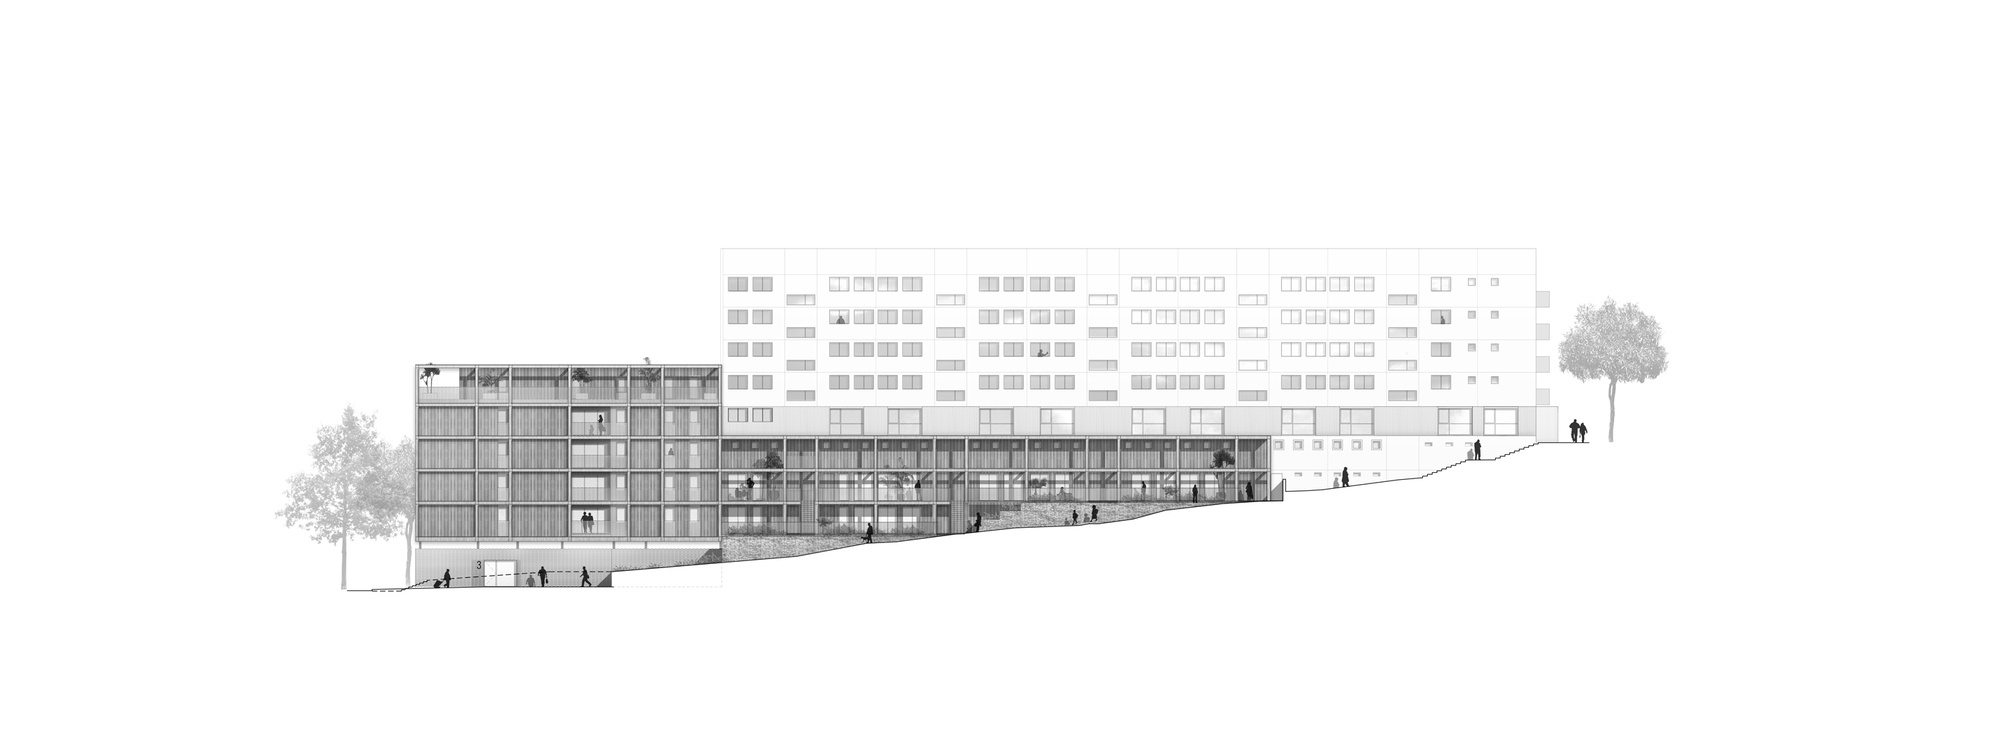 galer a de unidades de vivienda callot b1 jacques boucheton architectes 13. Black Bedroom Furniture Sets. Home Design Ideas